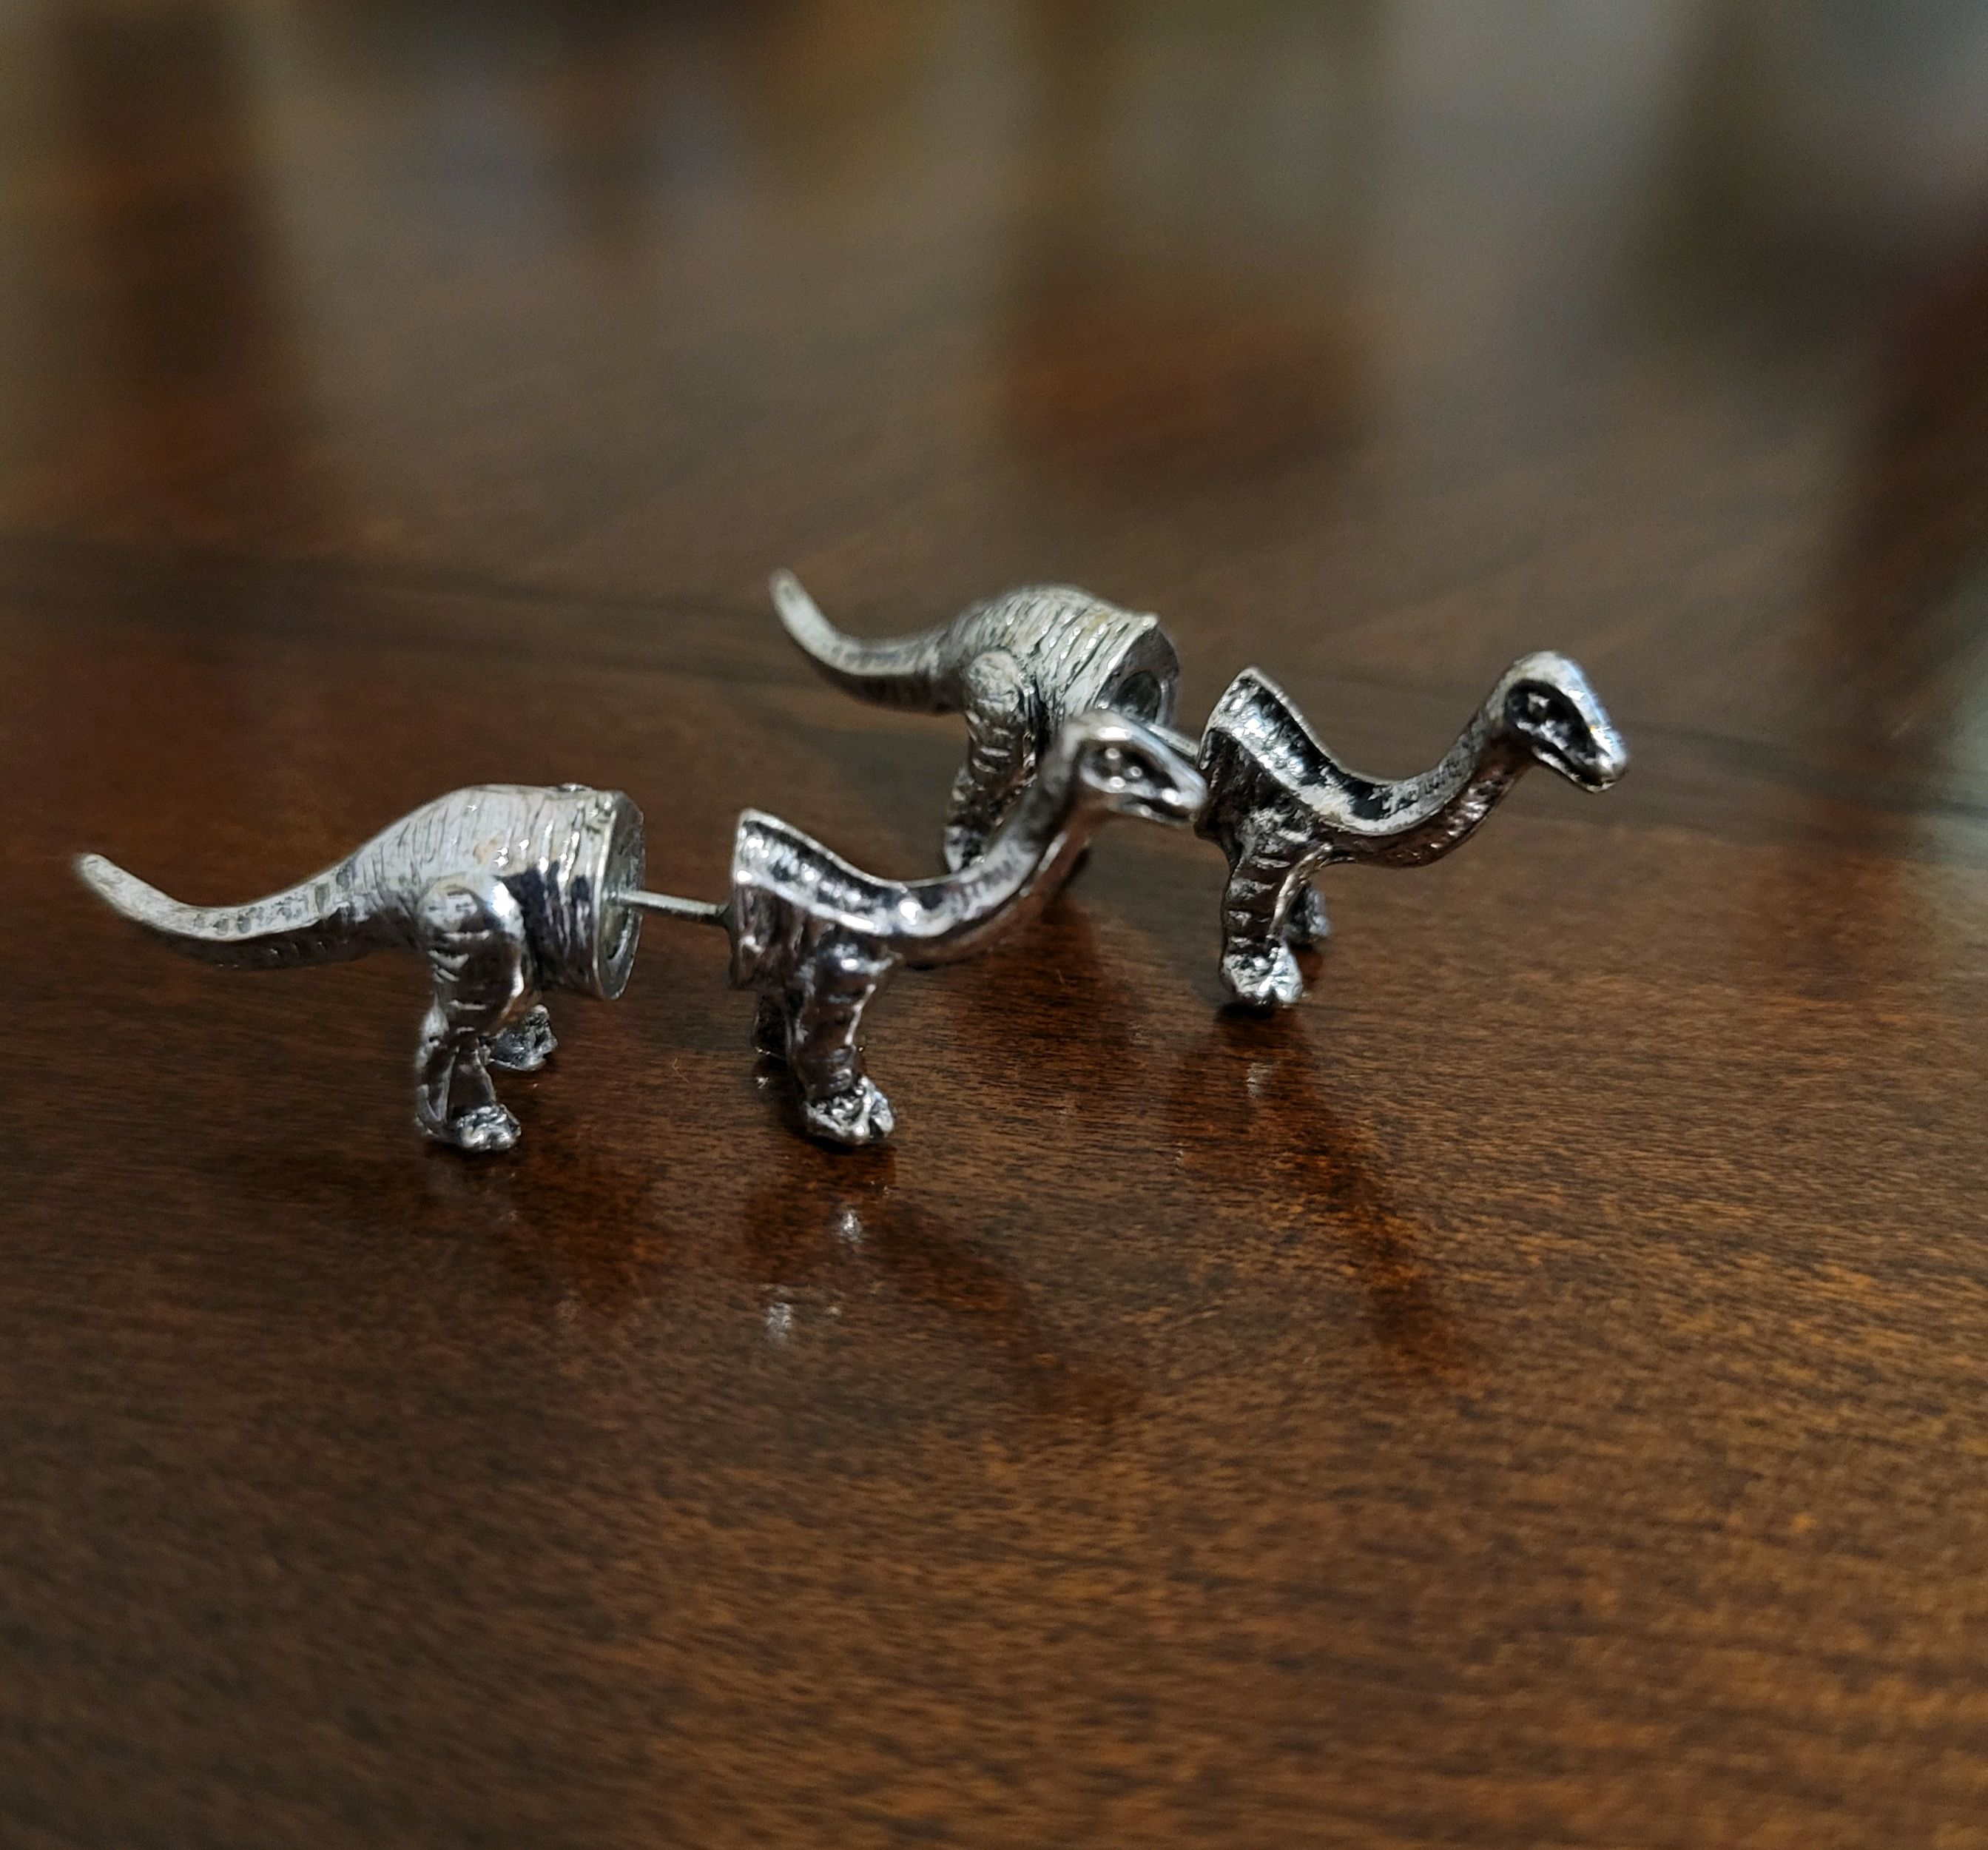 Dinosaur earings, the holder of precious memories